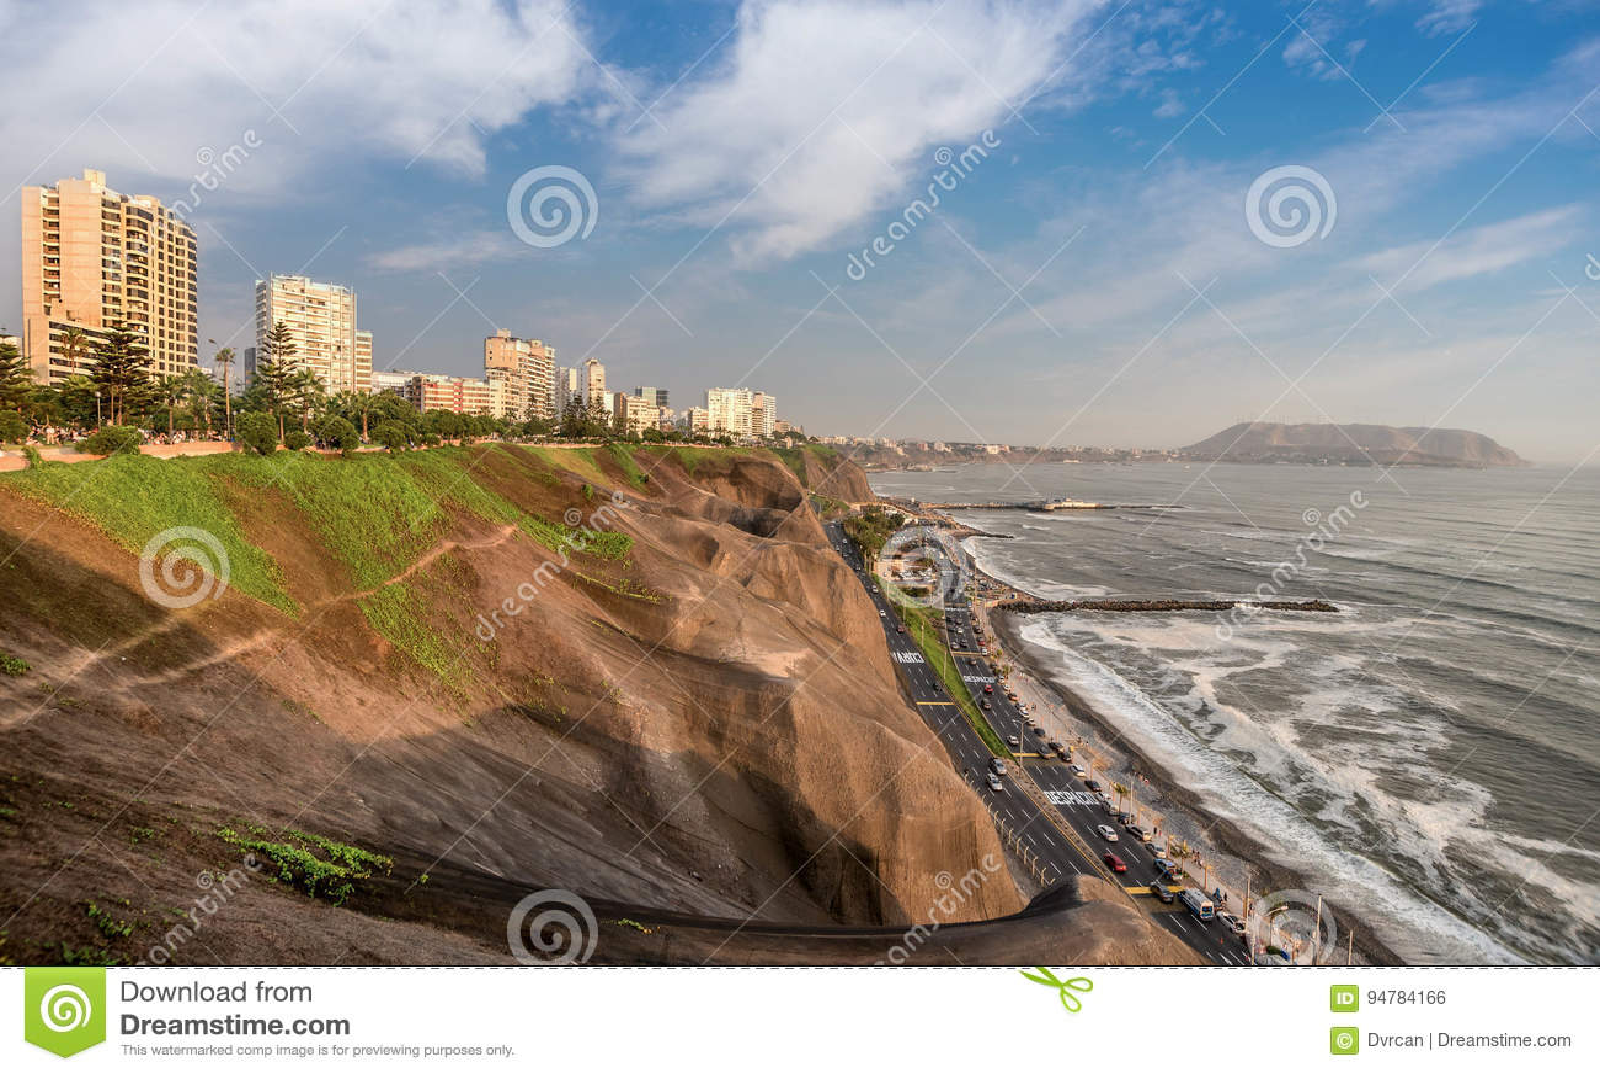 De Vreedzame kust van Miraflores in Lima, Peru